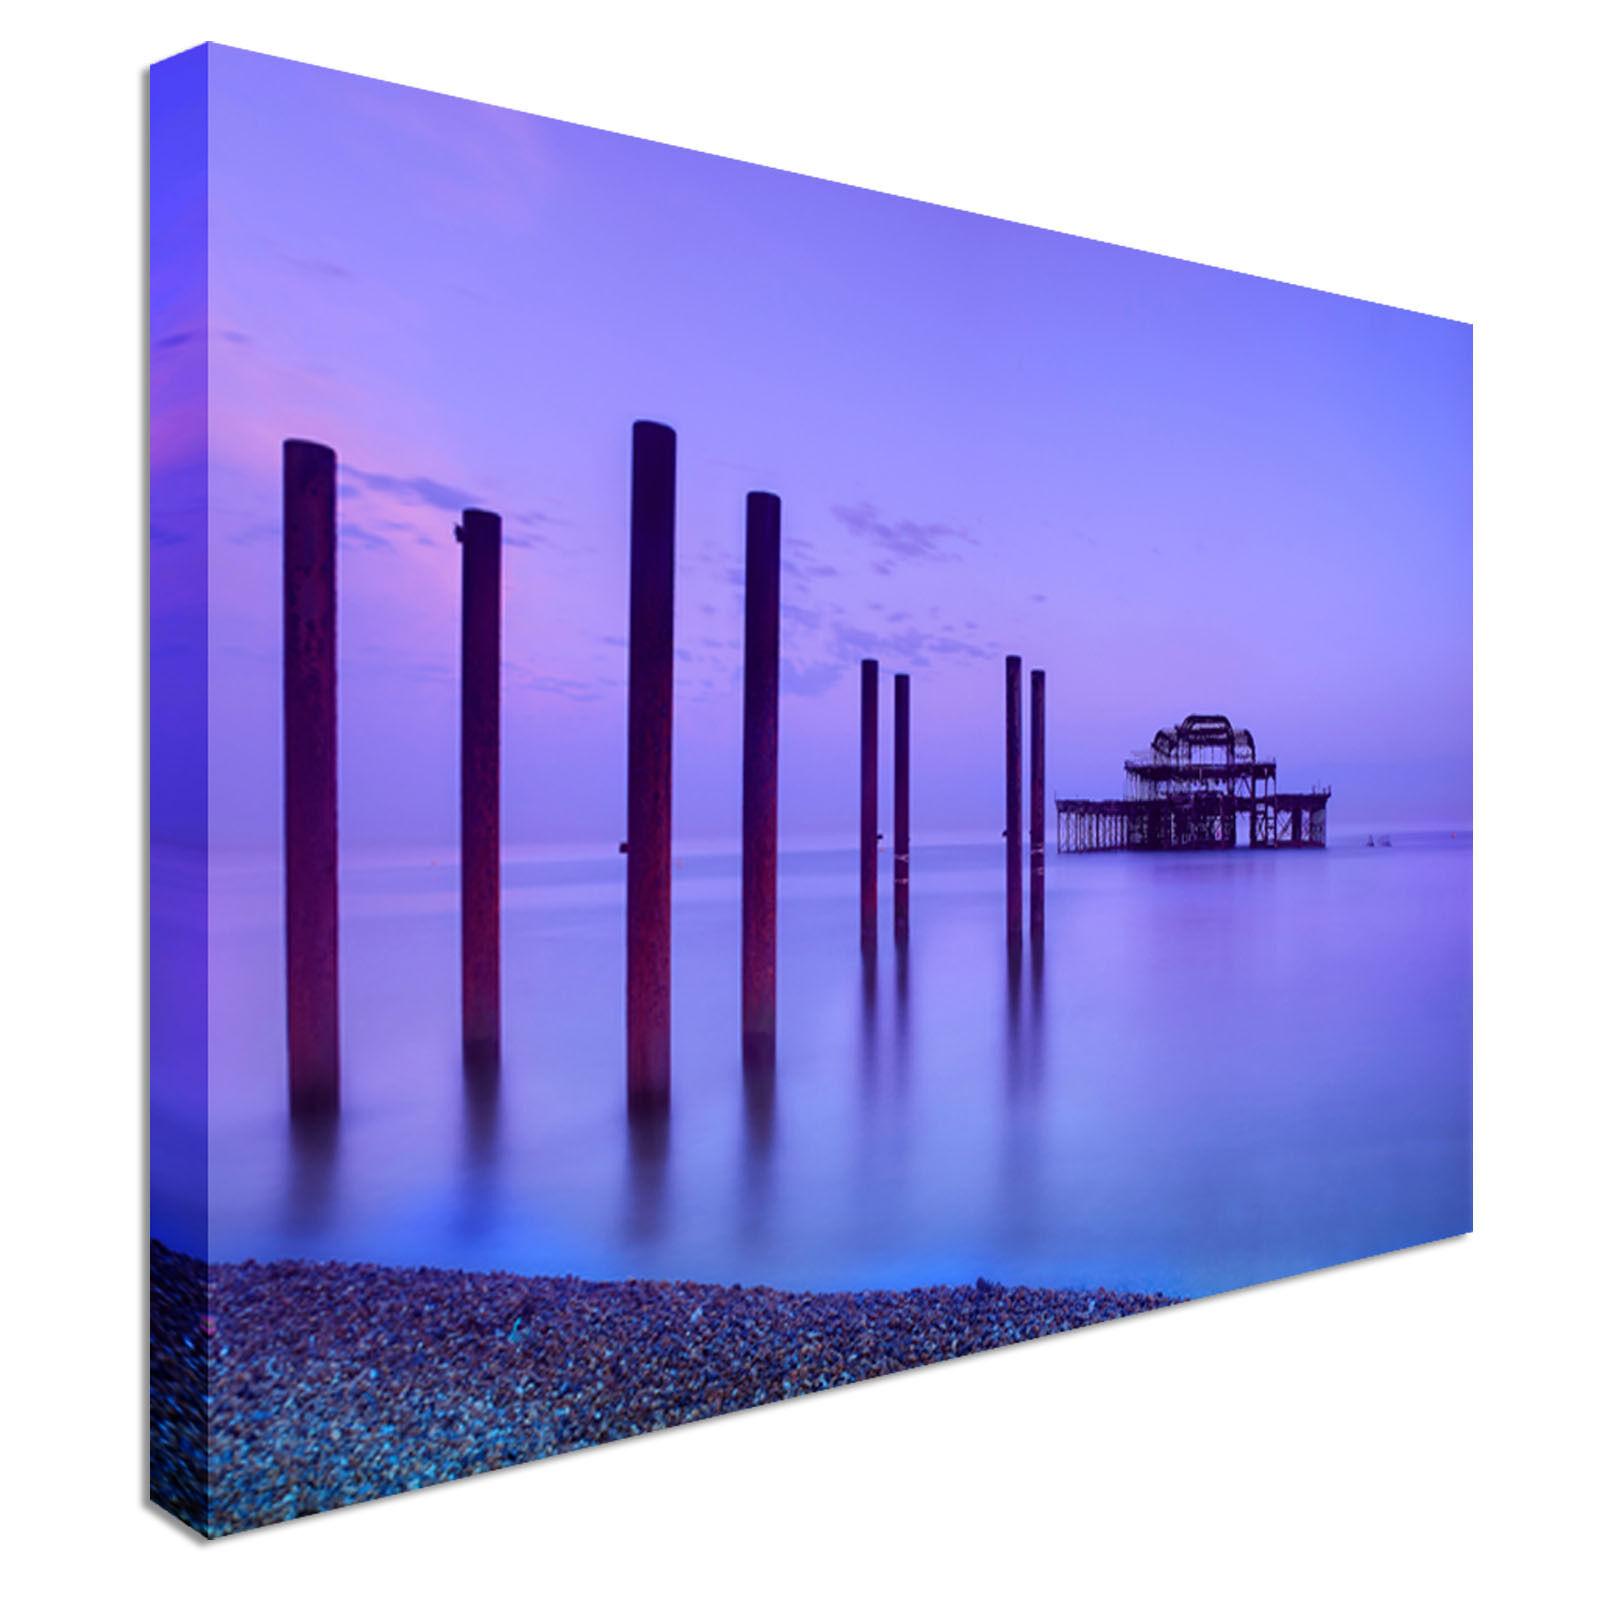 West Pier In Brighton At Dawn England Canvas Wall Art prints high quality